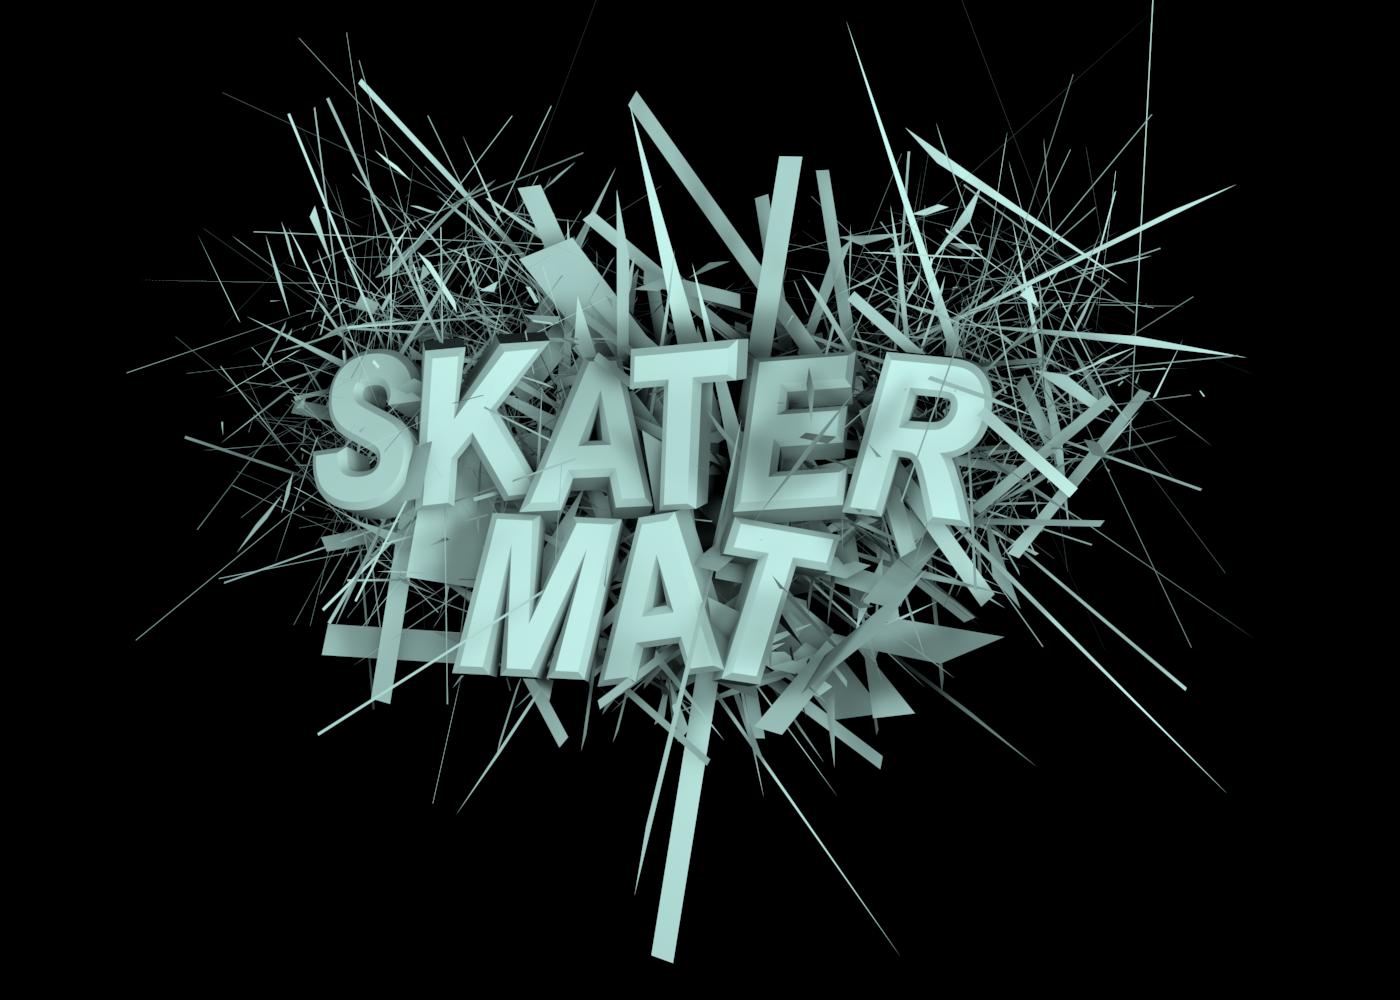 skatermat